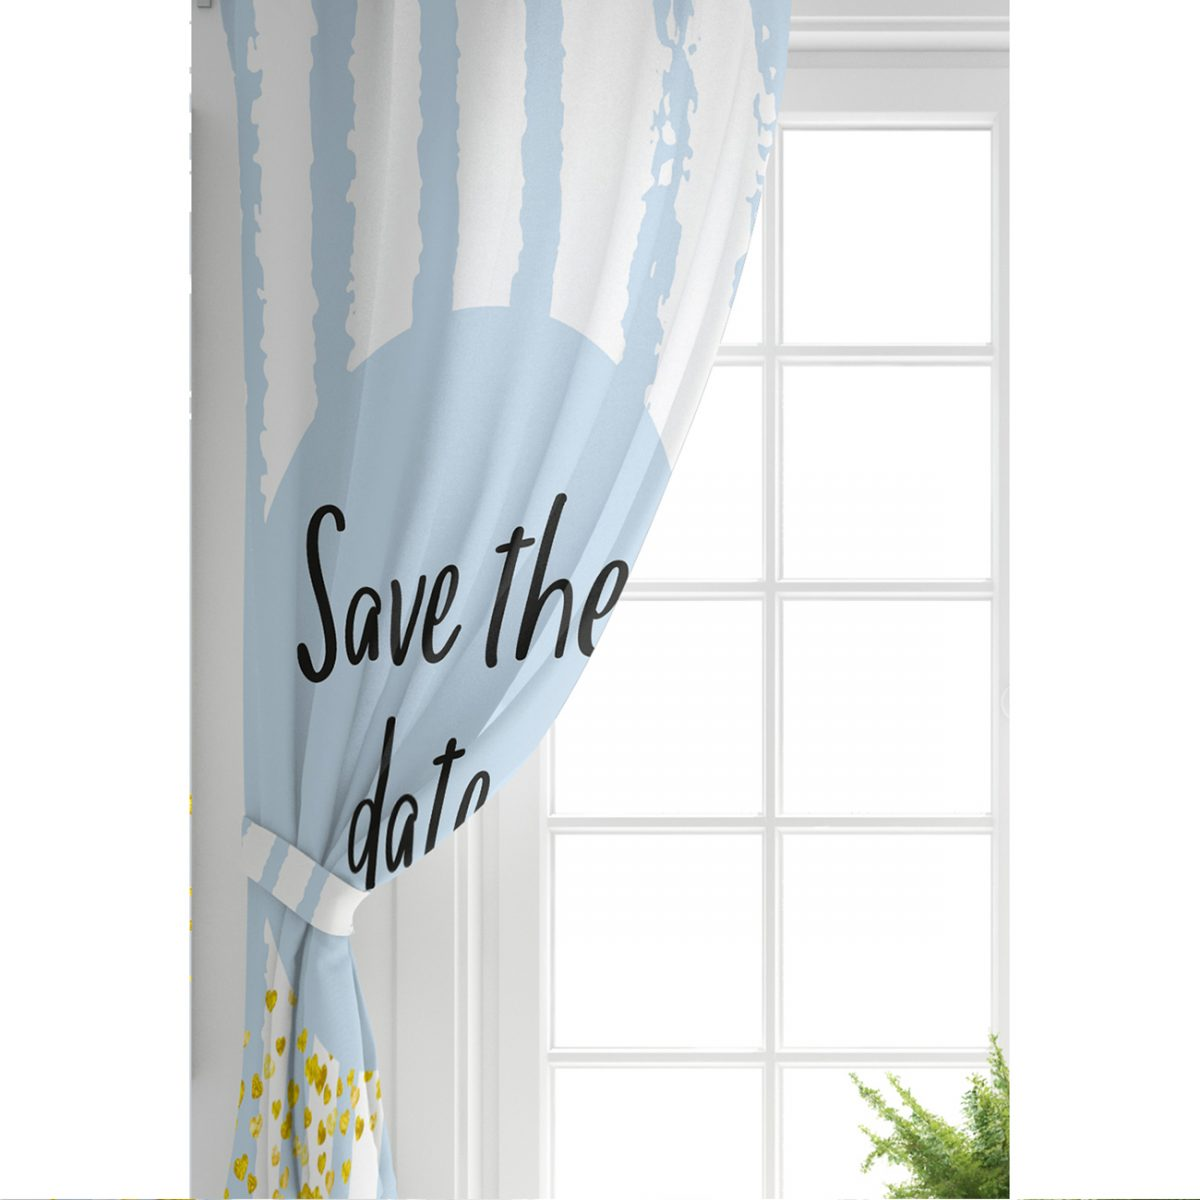 Mavi Zeminde Save The Date Motifli Çocuk Odası Fon Perde Realhomes